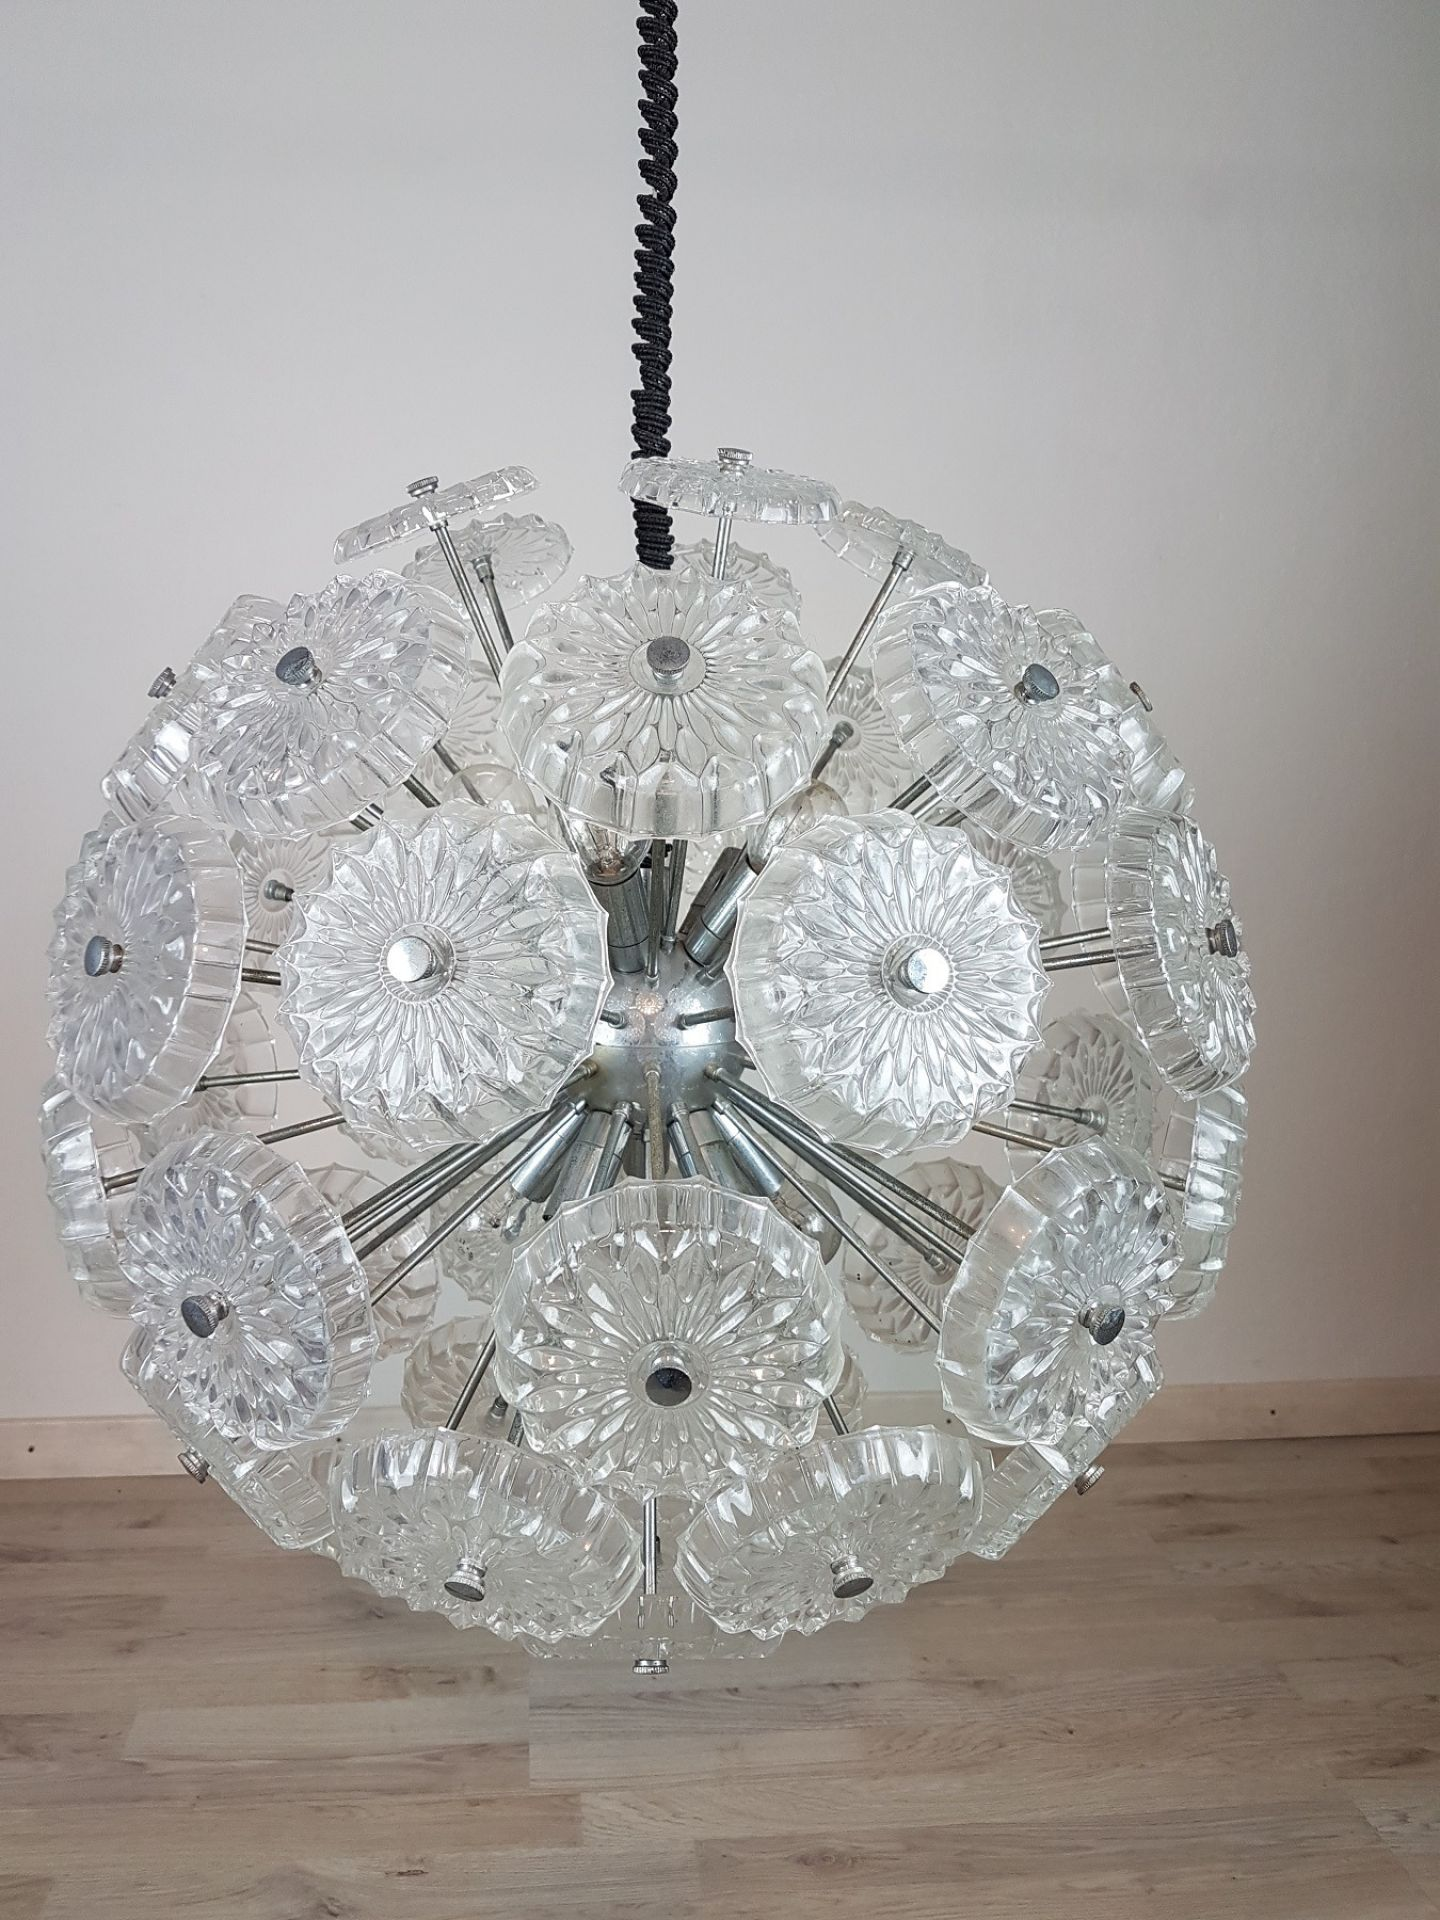 Sputnik Glass and Chrome Italian Design Chandelier, 1980s